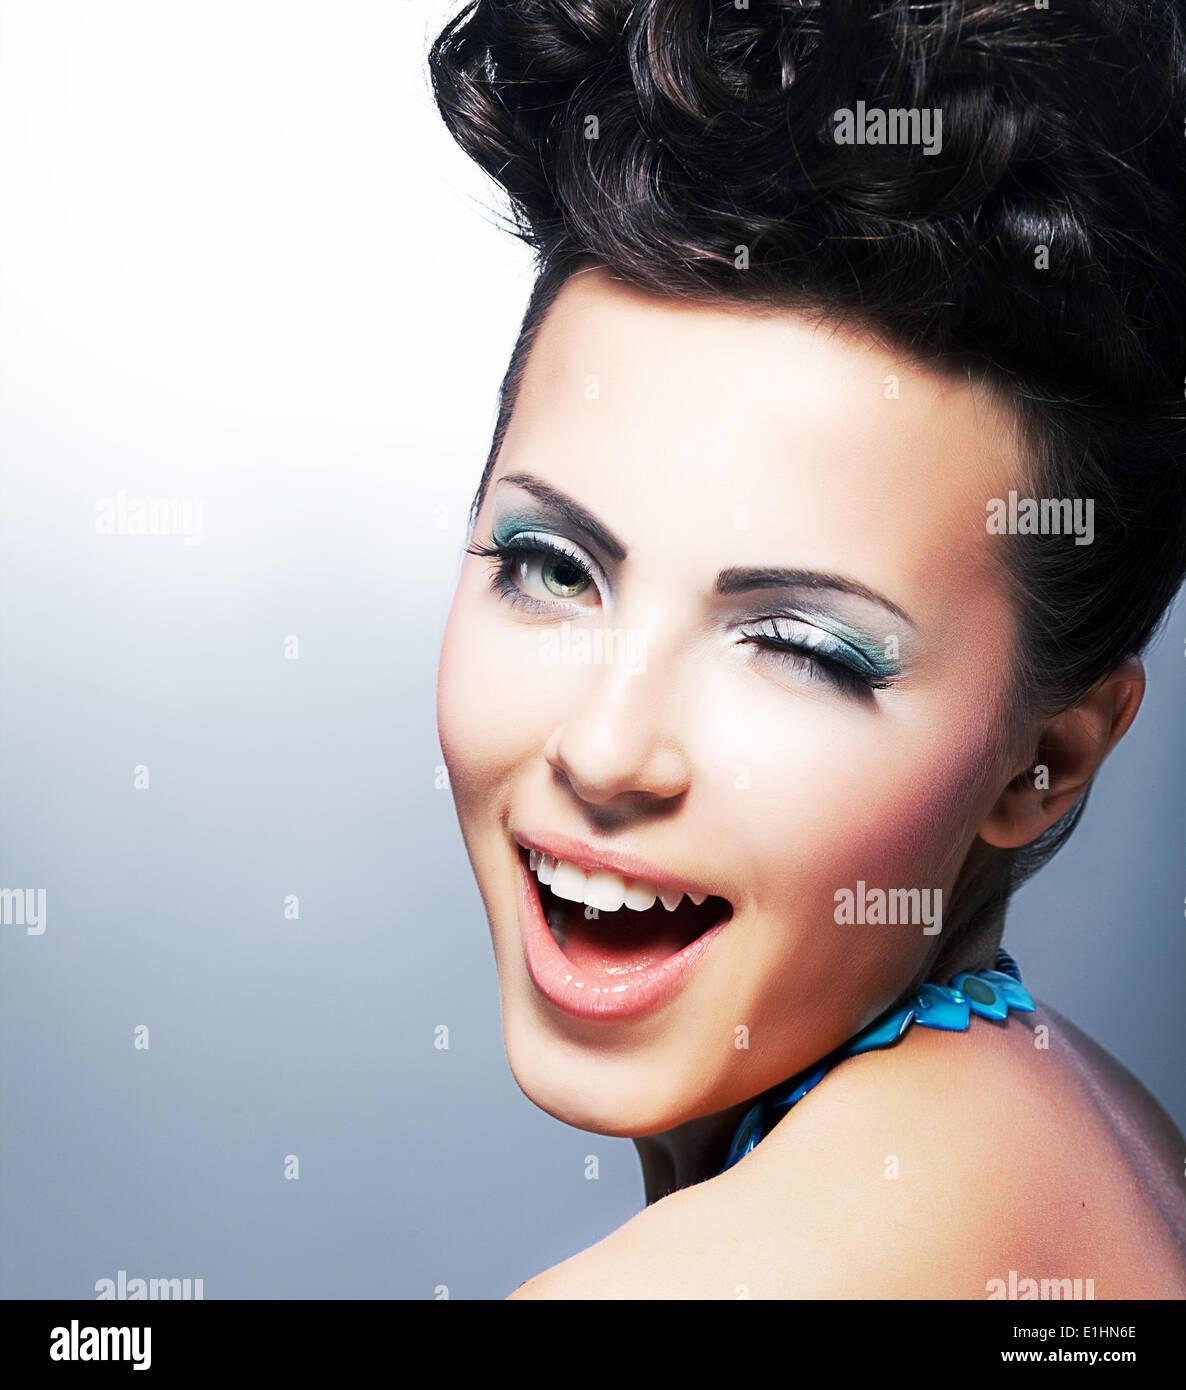 Delight. Happy Flirtatious Coquette smiling. Quizzical Smile - Stock Image